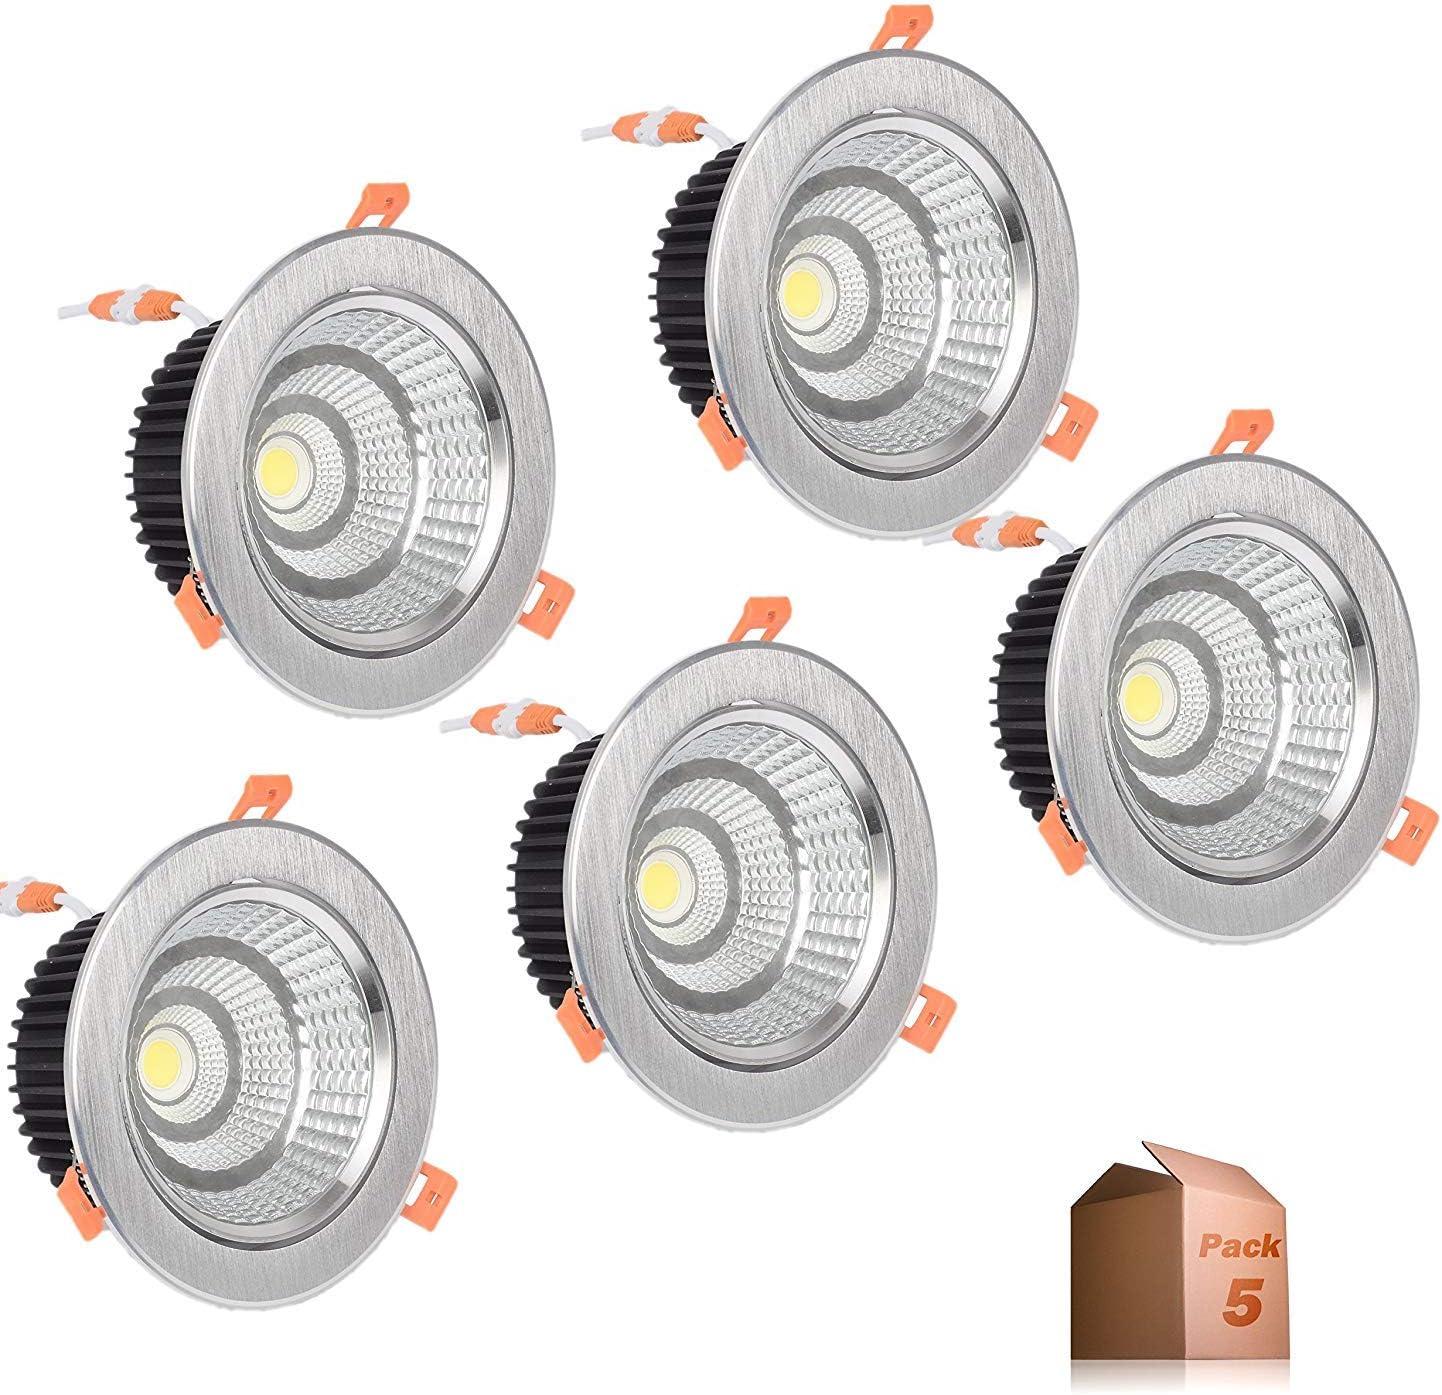 Foco Downlight LED 5W Aro Plateado Luz Fría 6000k (Pack 5) Ø85mm ...